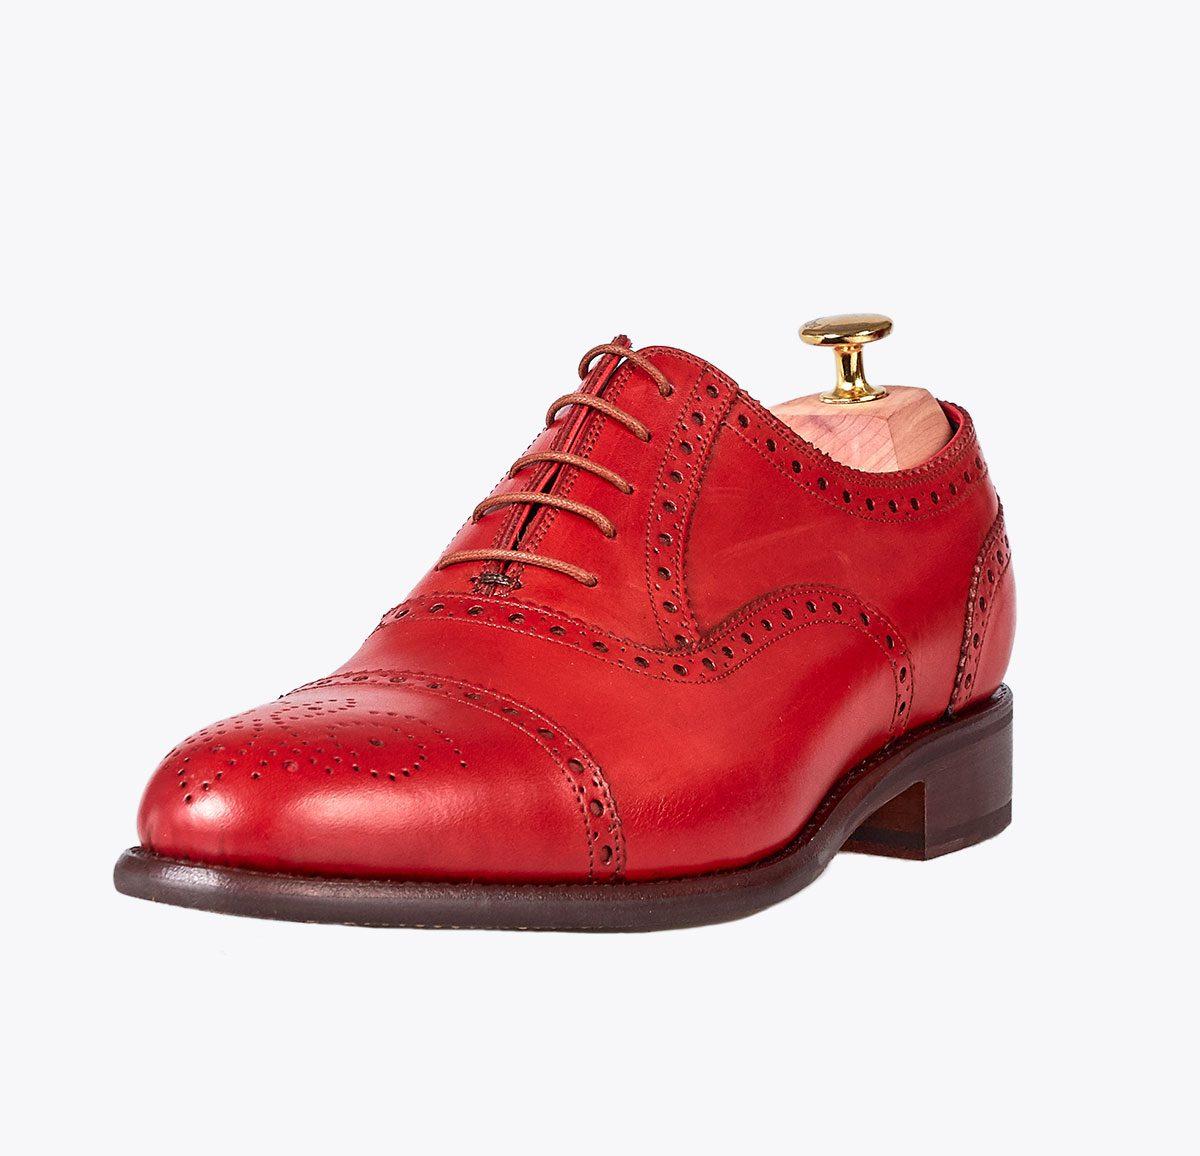 Zapato Córdoba hecho a mano en mandalashoes, Santanyí Mallorca. Hand made shoes. Nach Mass Schuhe